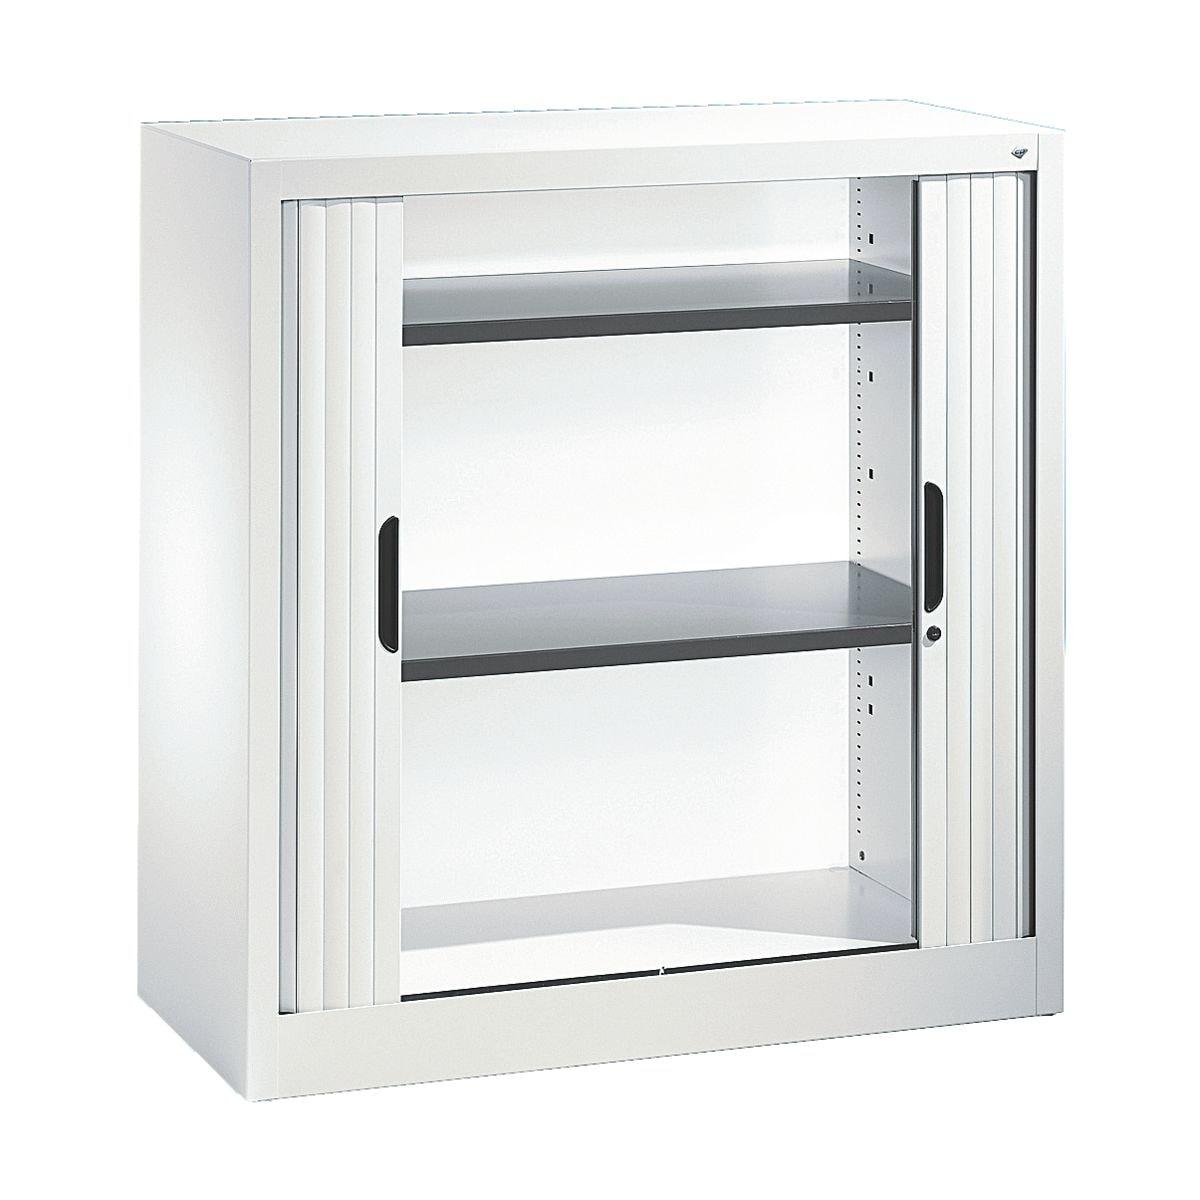 cp armoire en acier omnispace verrouillable 100 x 105 cm. Black Bedroom Furniture Sets. Home Design Ideas